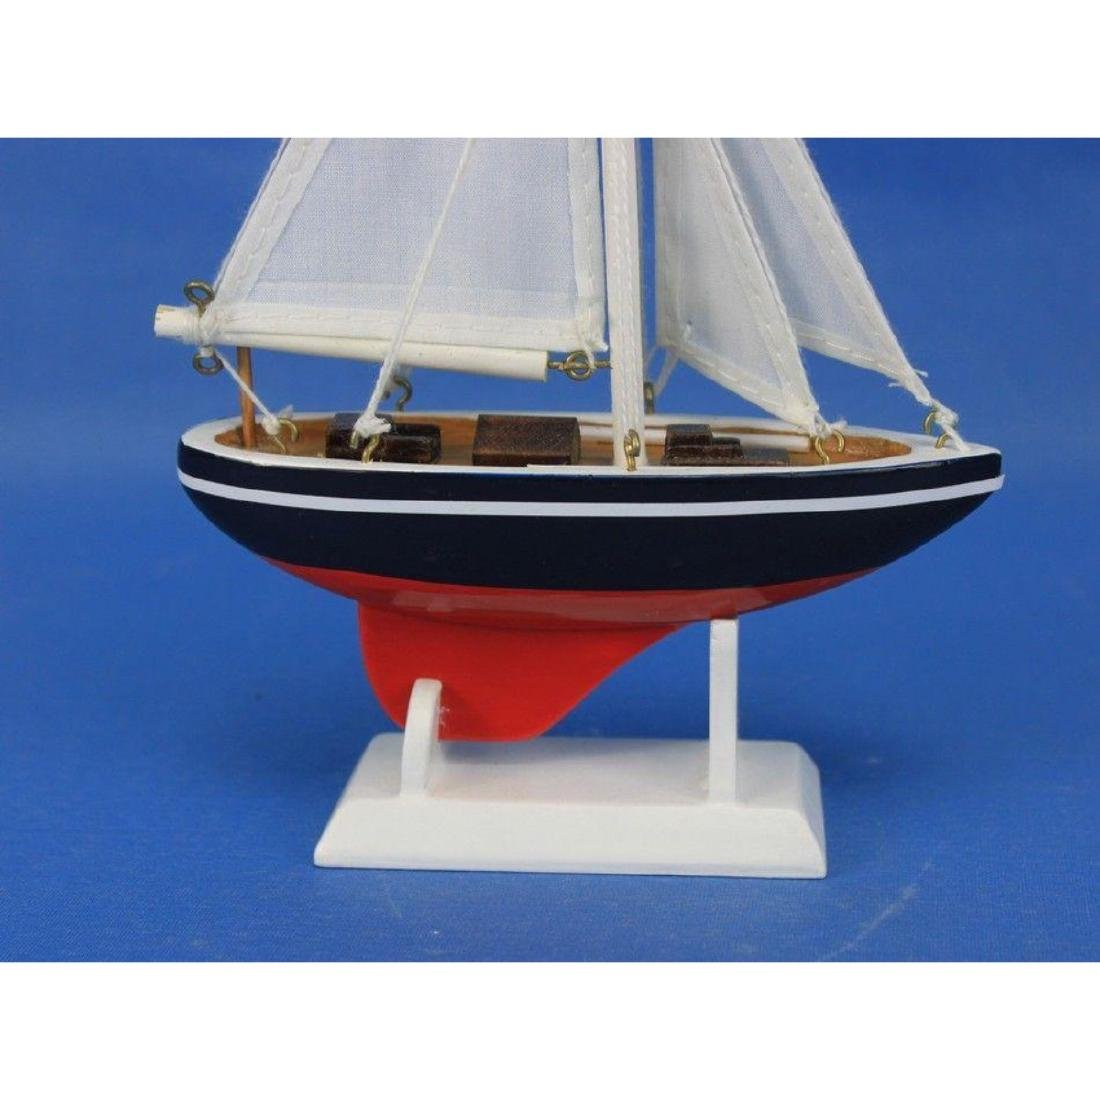 "Wooden American Sailer Model Sailboat Decoration 9"""